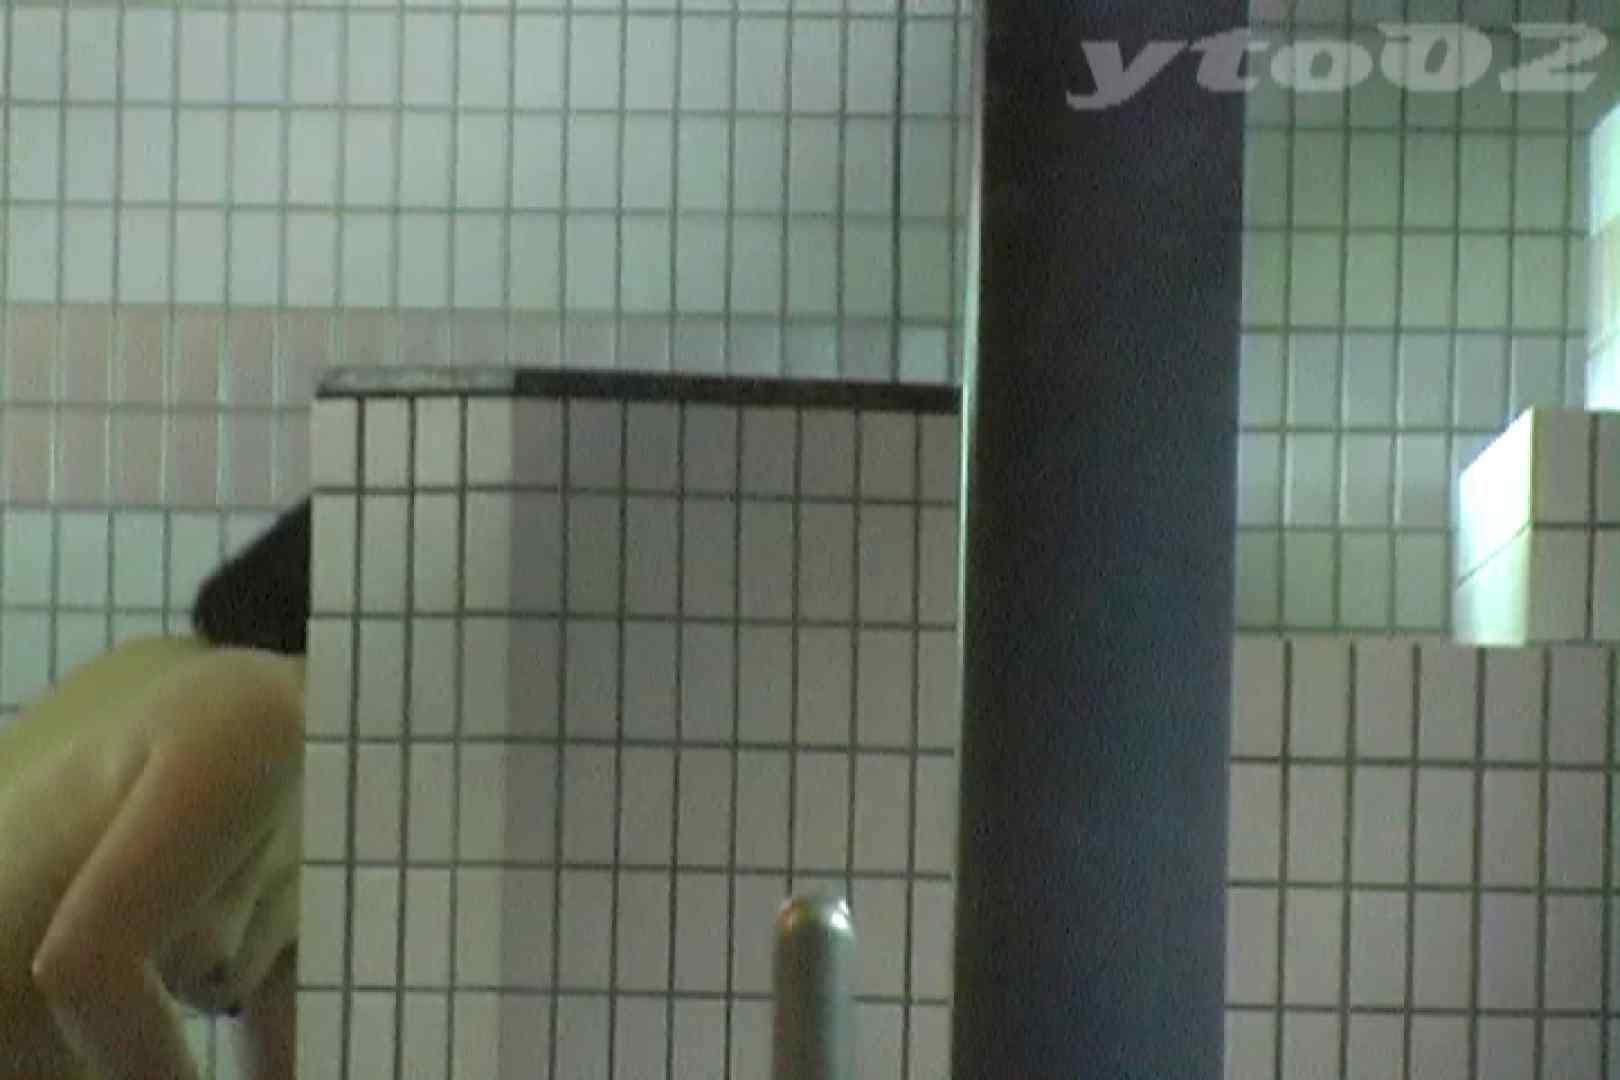 【期間限定配信】合宿ホテル女風呂盗撮 Vol.15 合宿中の女子 セックス無修正動画無料 62PIX 34